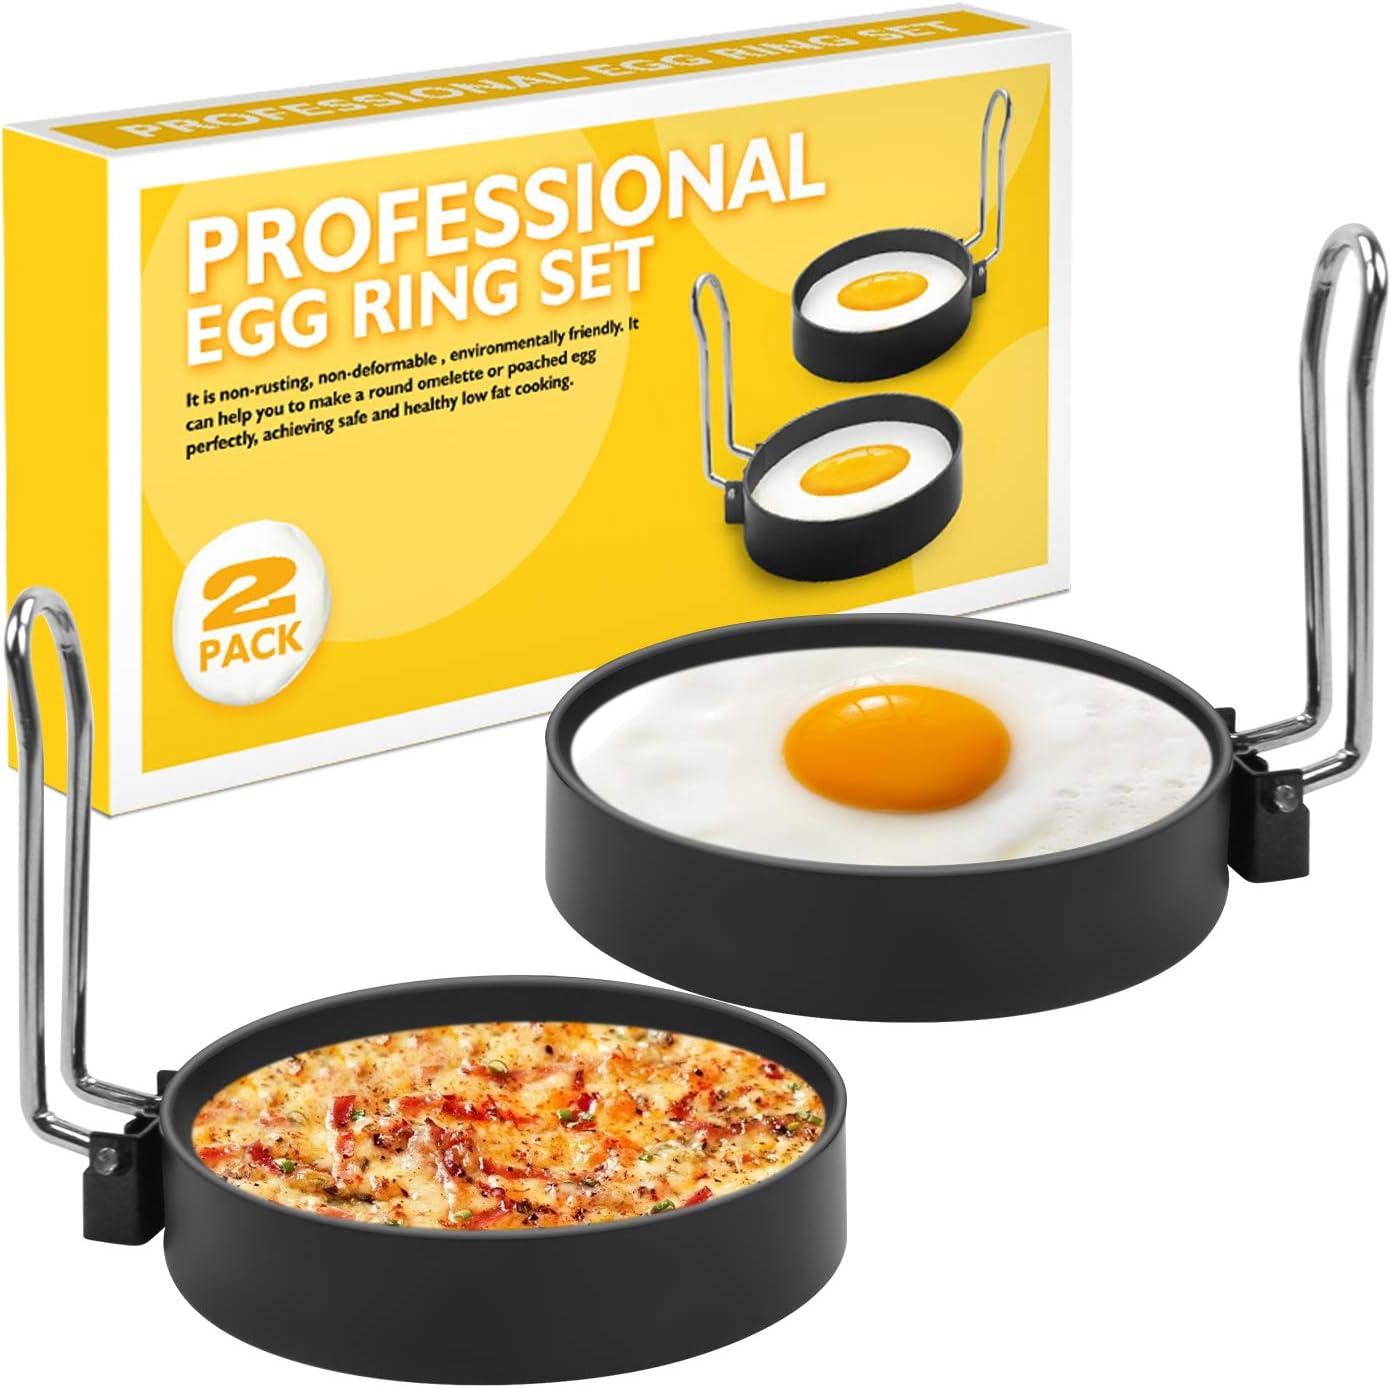 Dricroda Egg Ring, Egg Muffin Maker, Round Egg Mold Tool For Breakfast Fried Eggs Pancakes Sandwiches Biscuit, 3